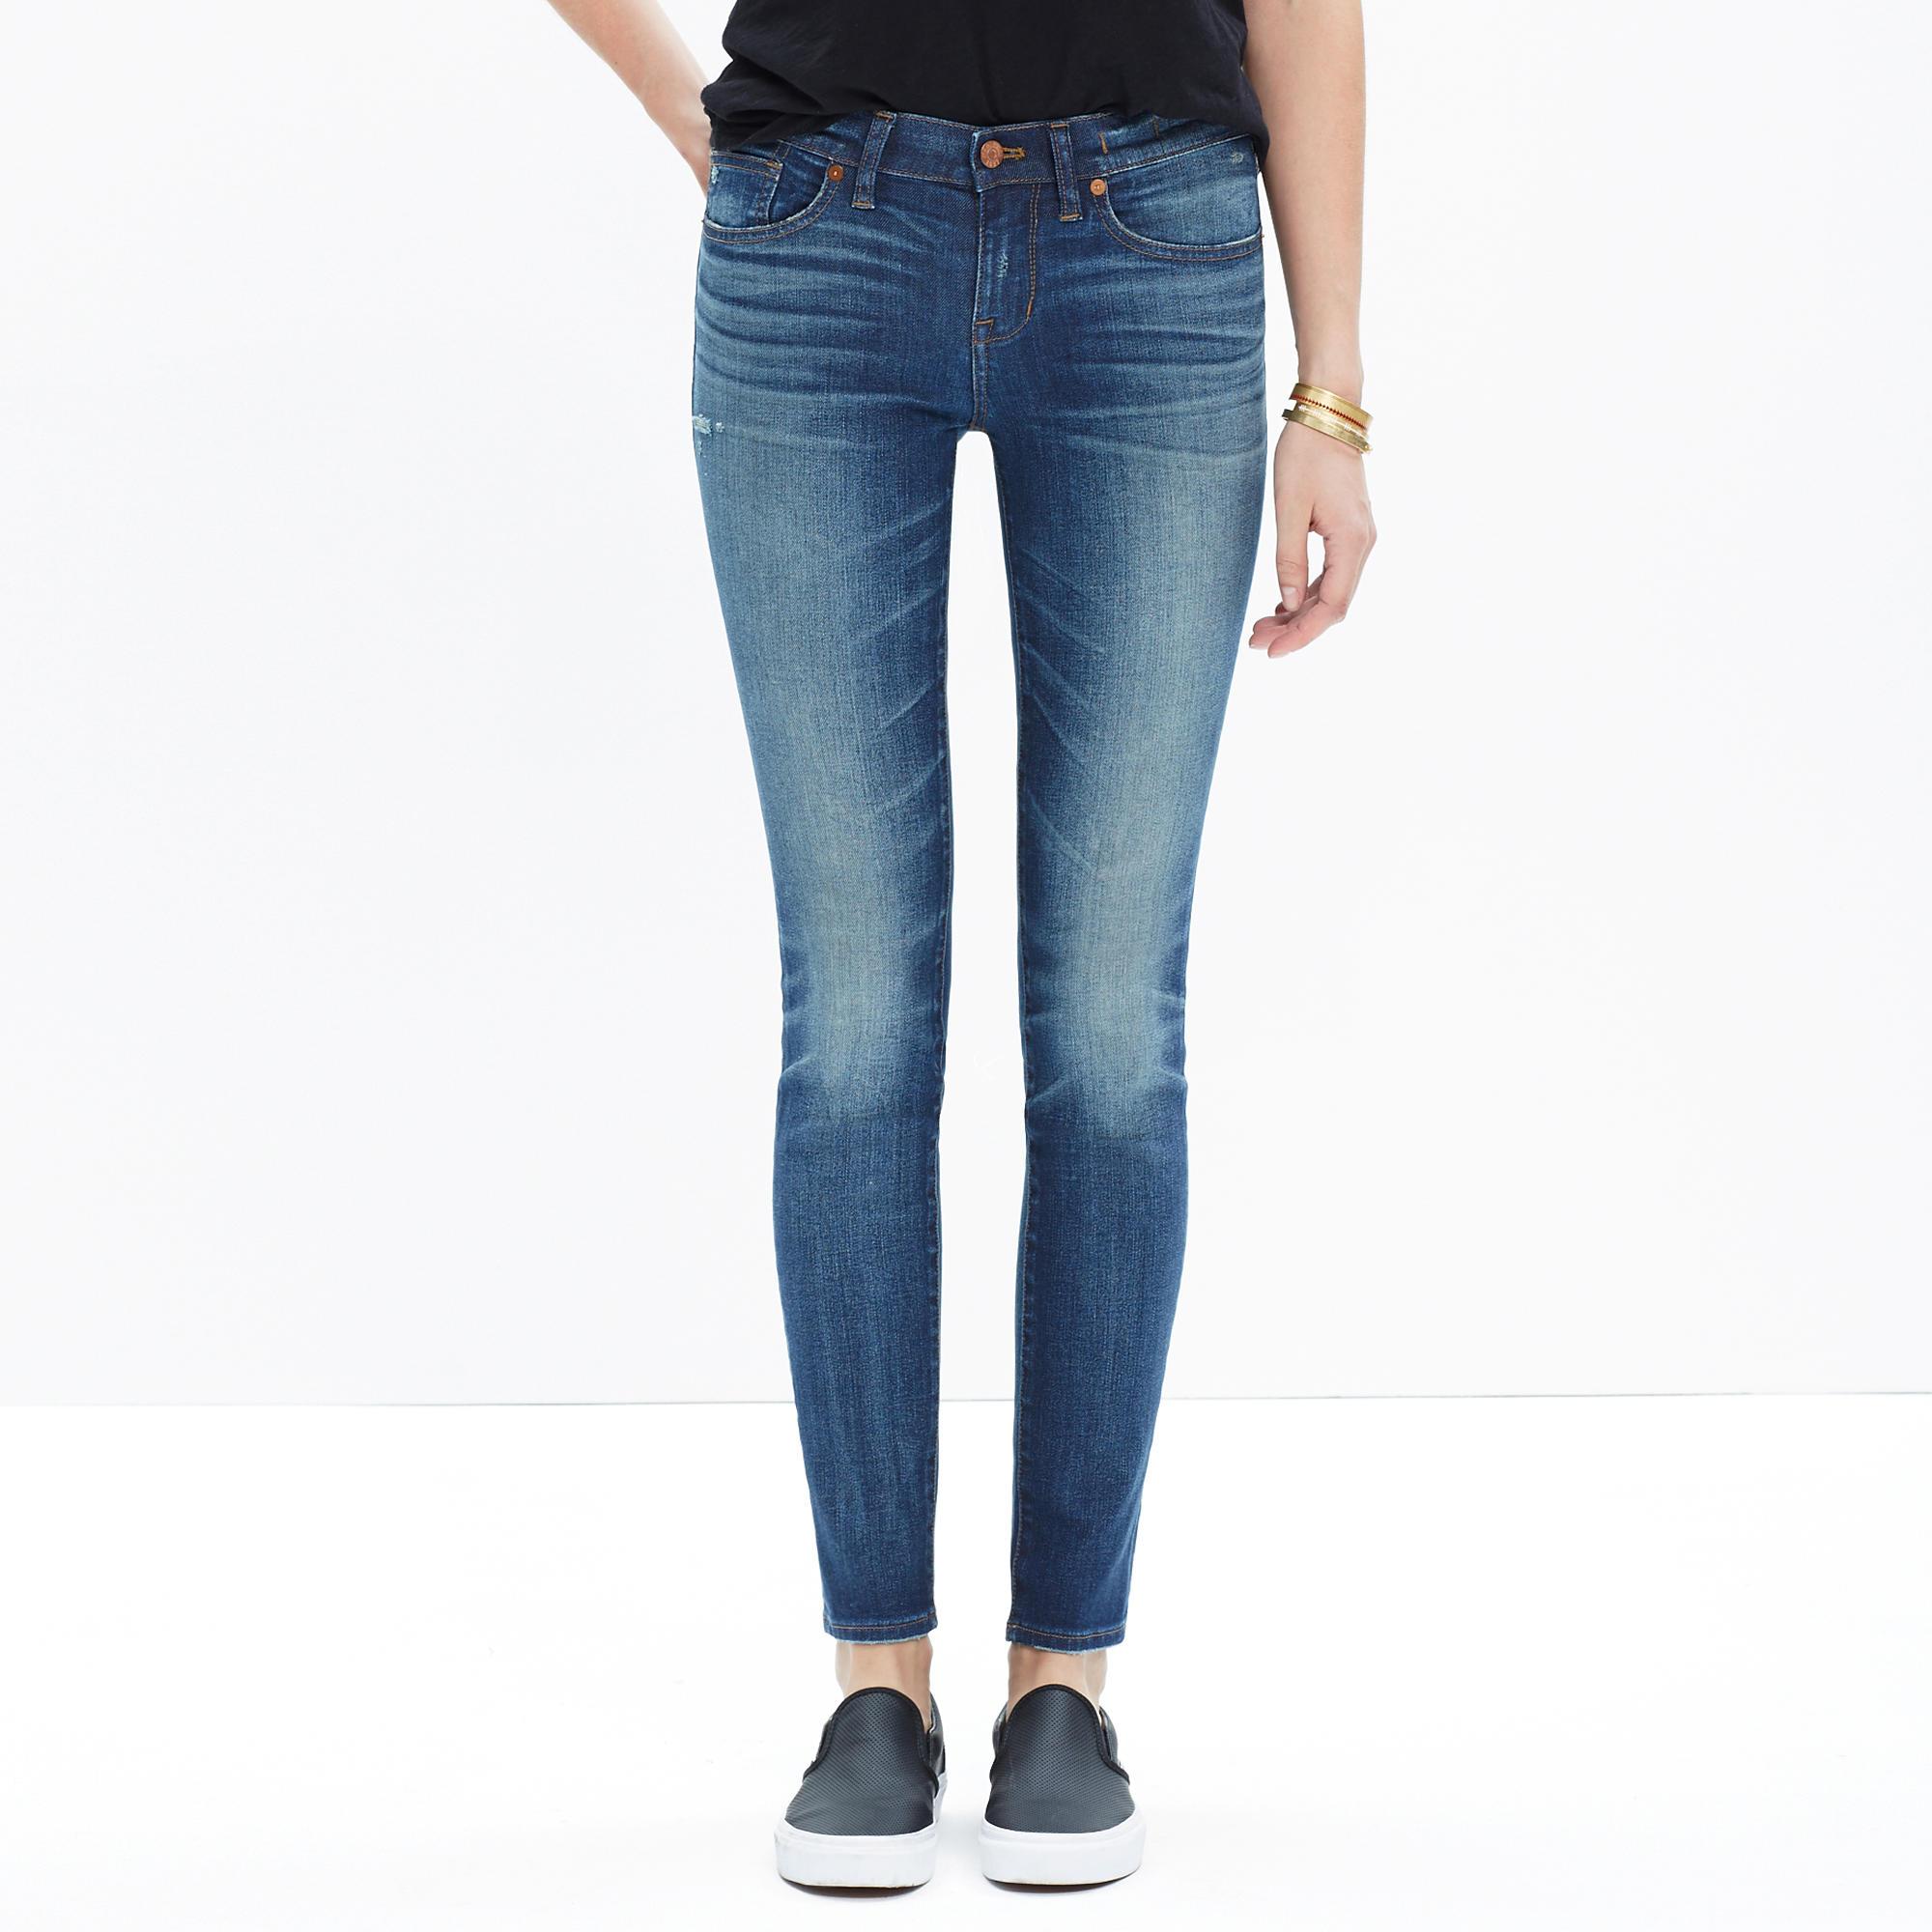 Skinny Skinny Jeans in Edmonton Wash : skinny jeans   Madewell